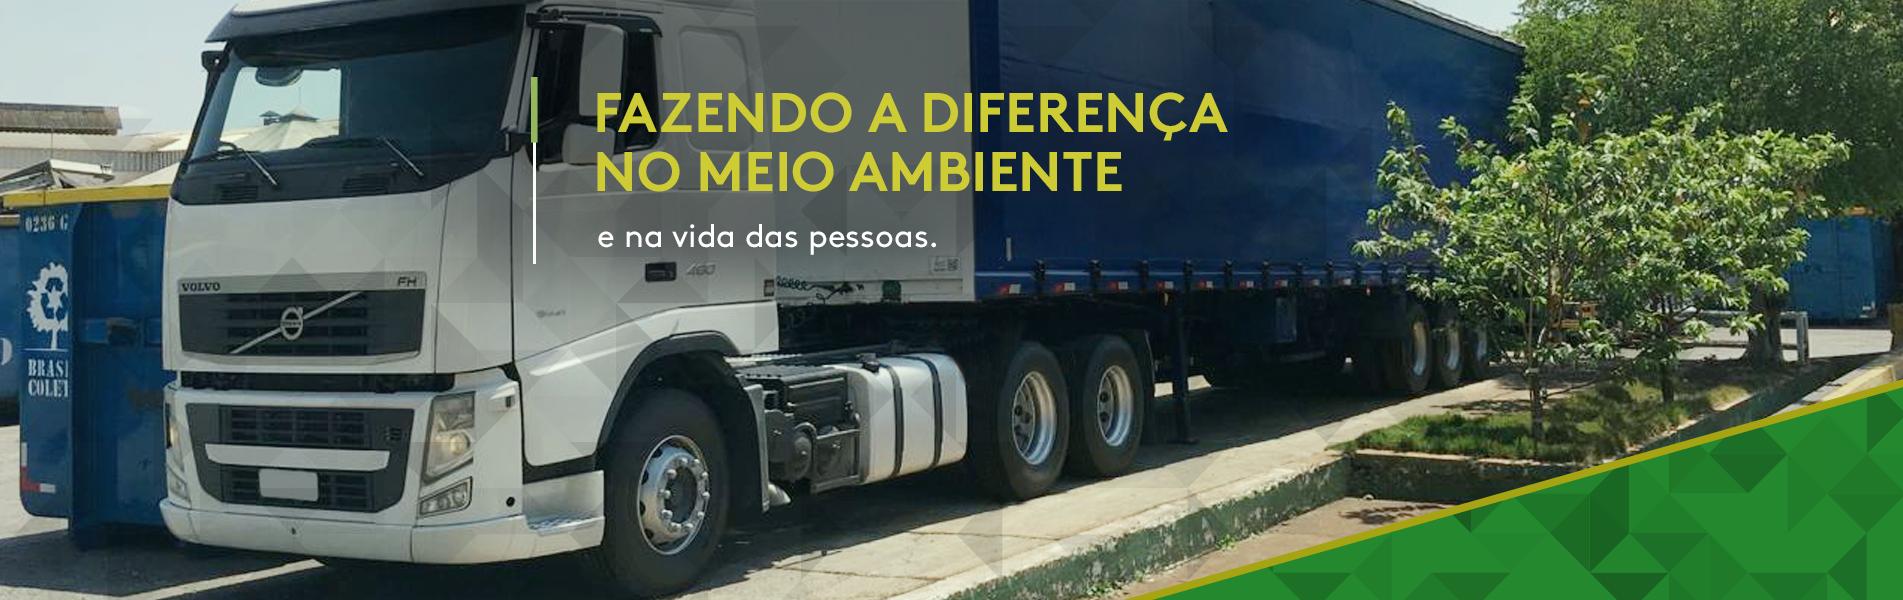 A Empresa | Brasil Coleta